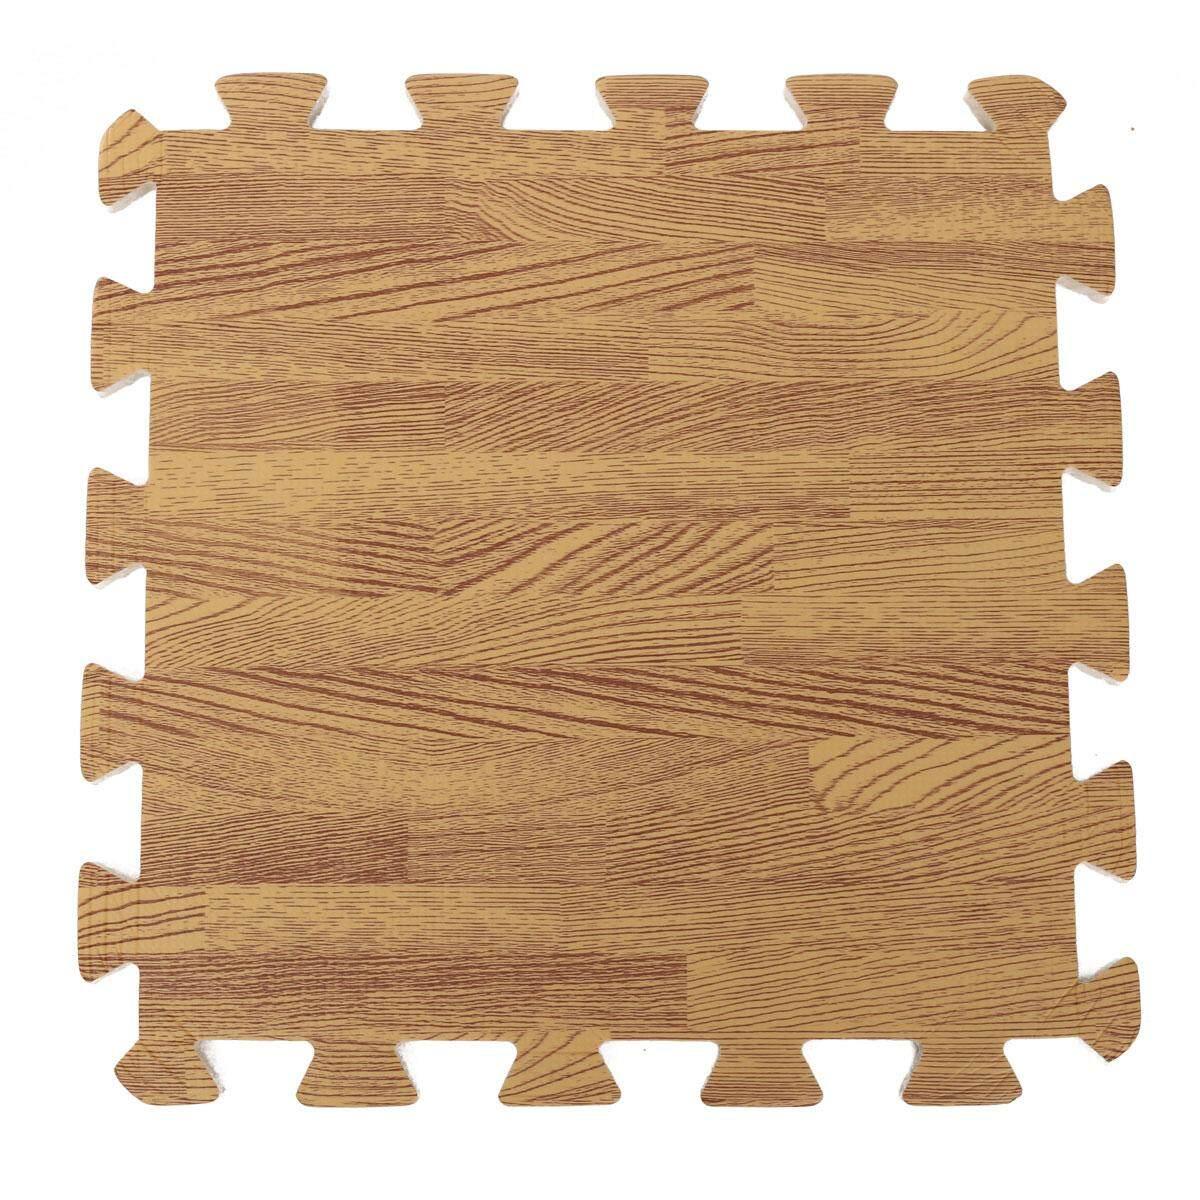 18pcs Wood Interlock Eva Foam Floor Puzzle Pad Work Gym Mat Kid Safety Play Rug By Glimmer.